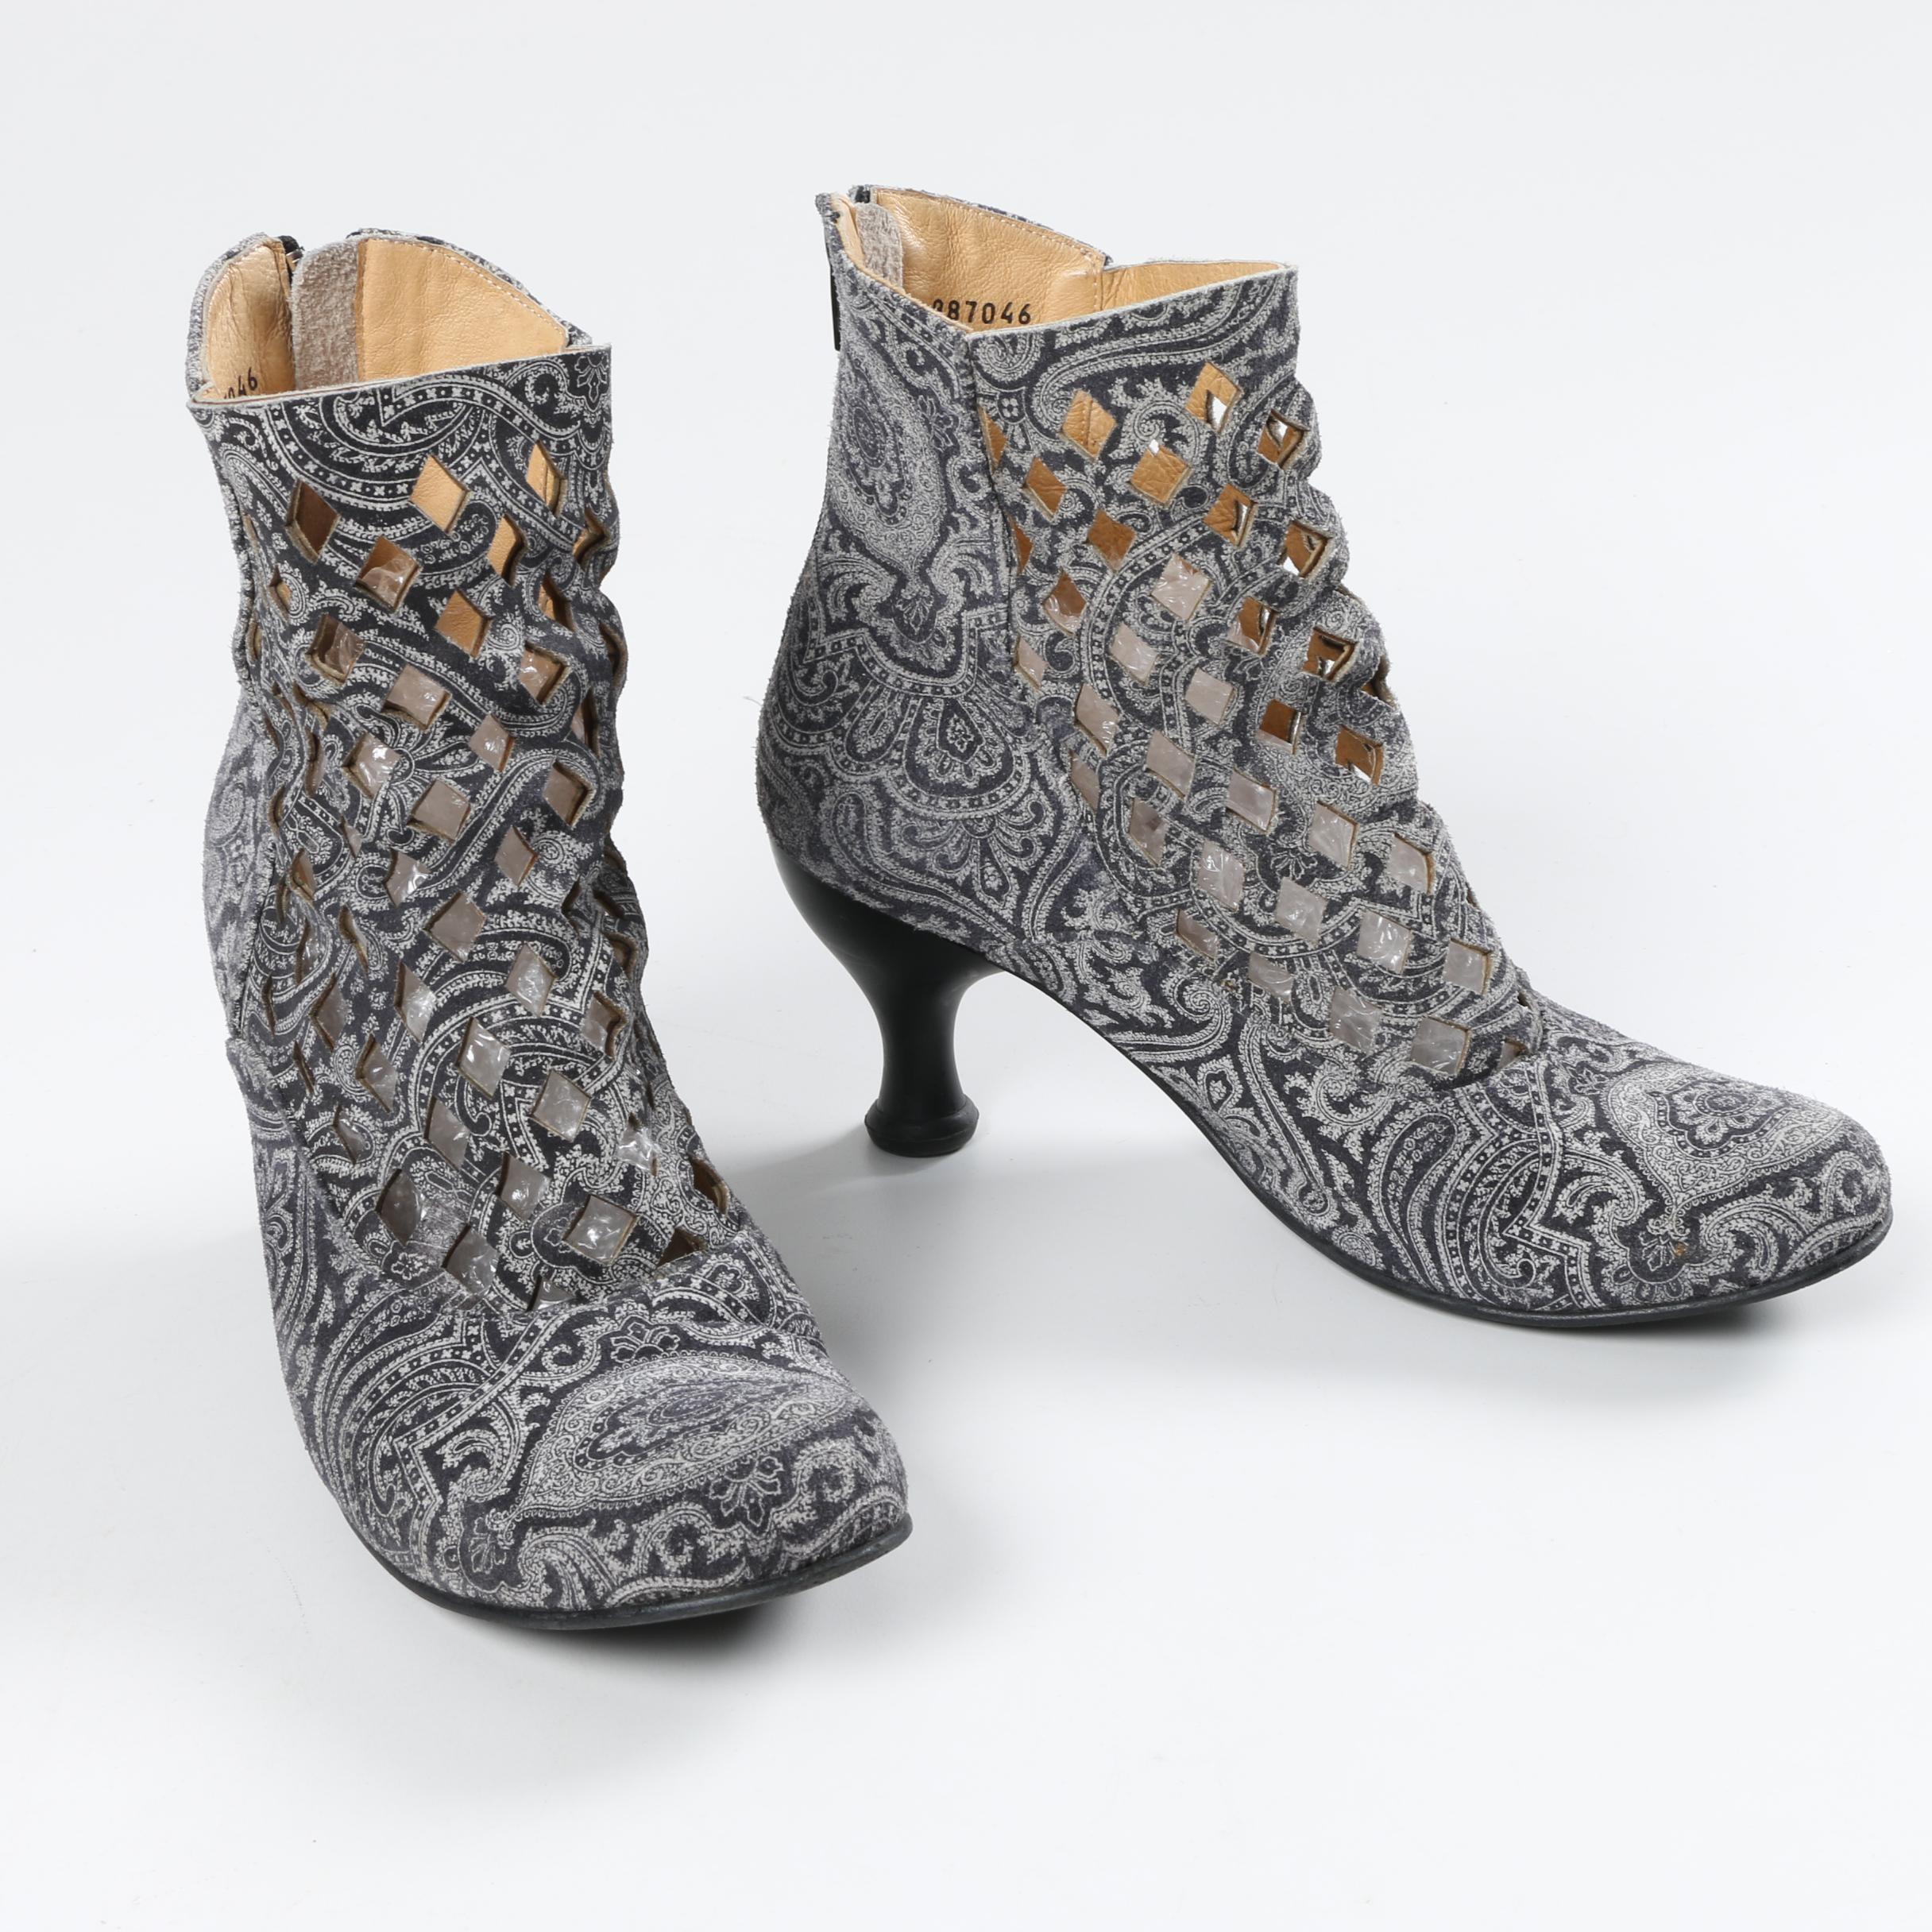 Women's John Fluevog Baroques Murillo Paisley Print Suede Ankle Boots